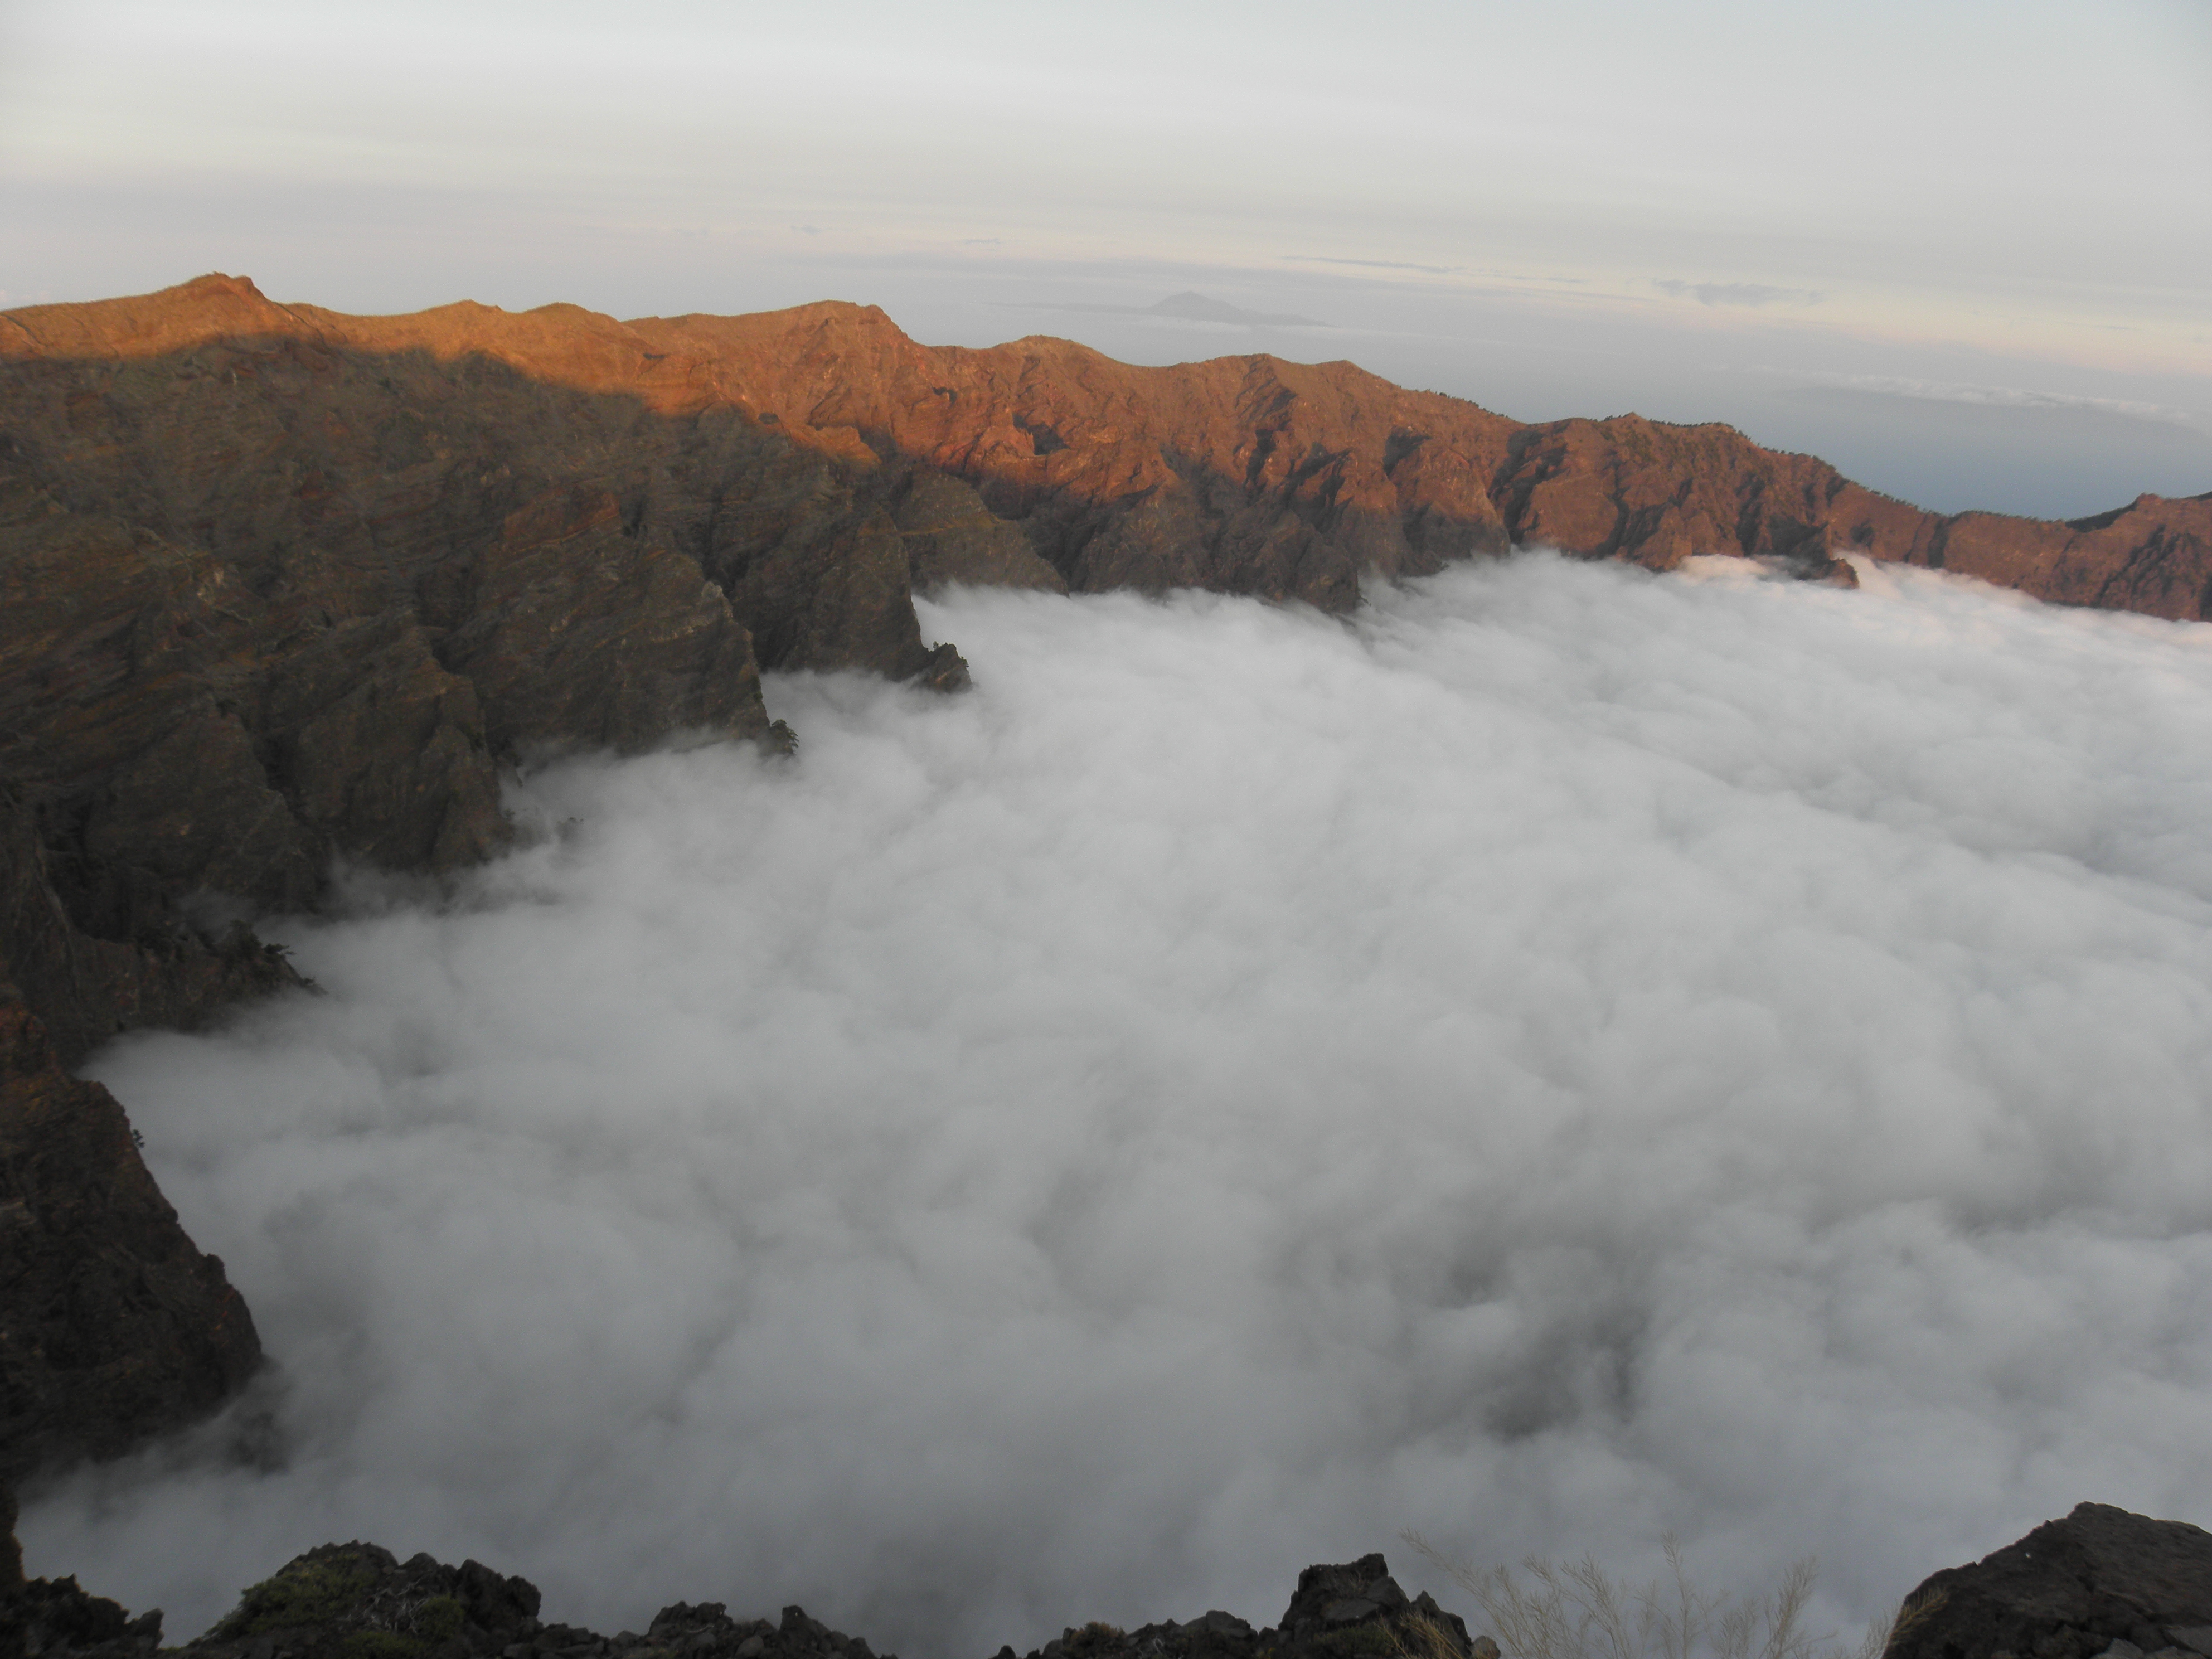 Caldera de Taburiente National Park - Wikipedia